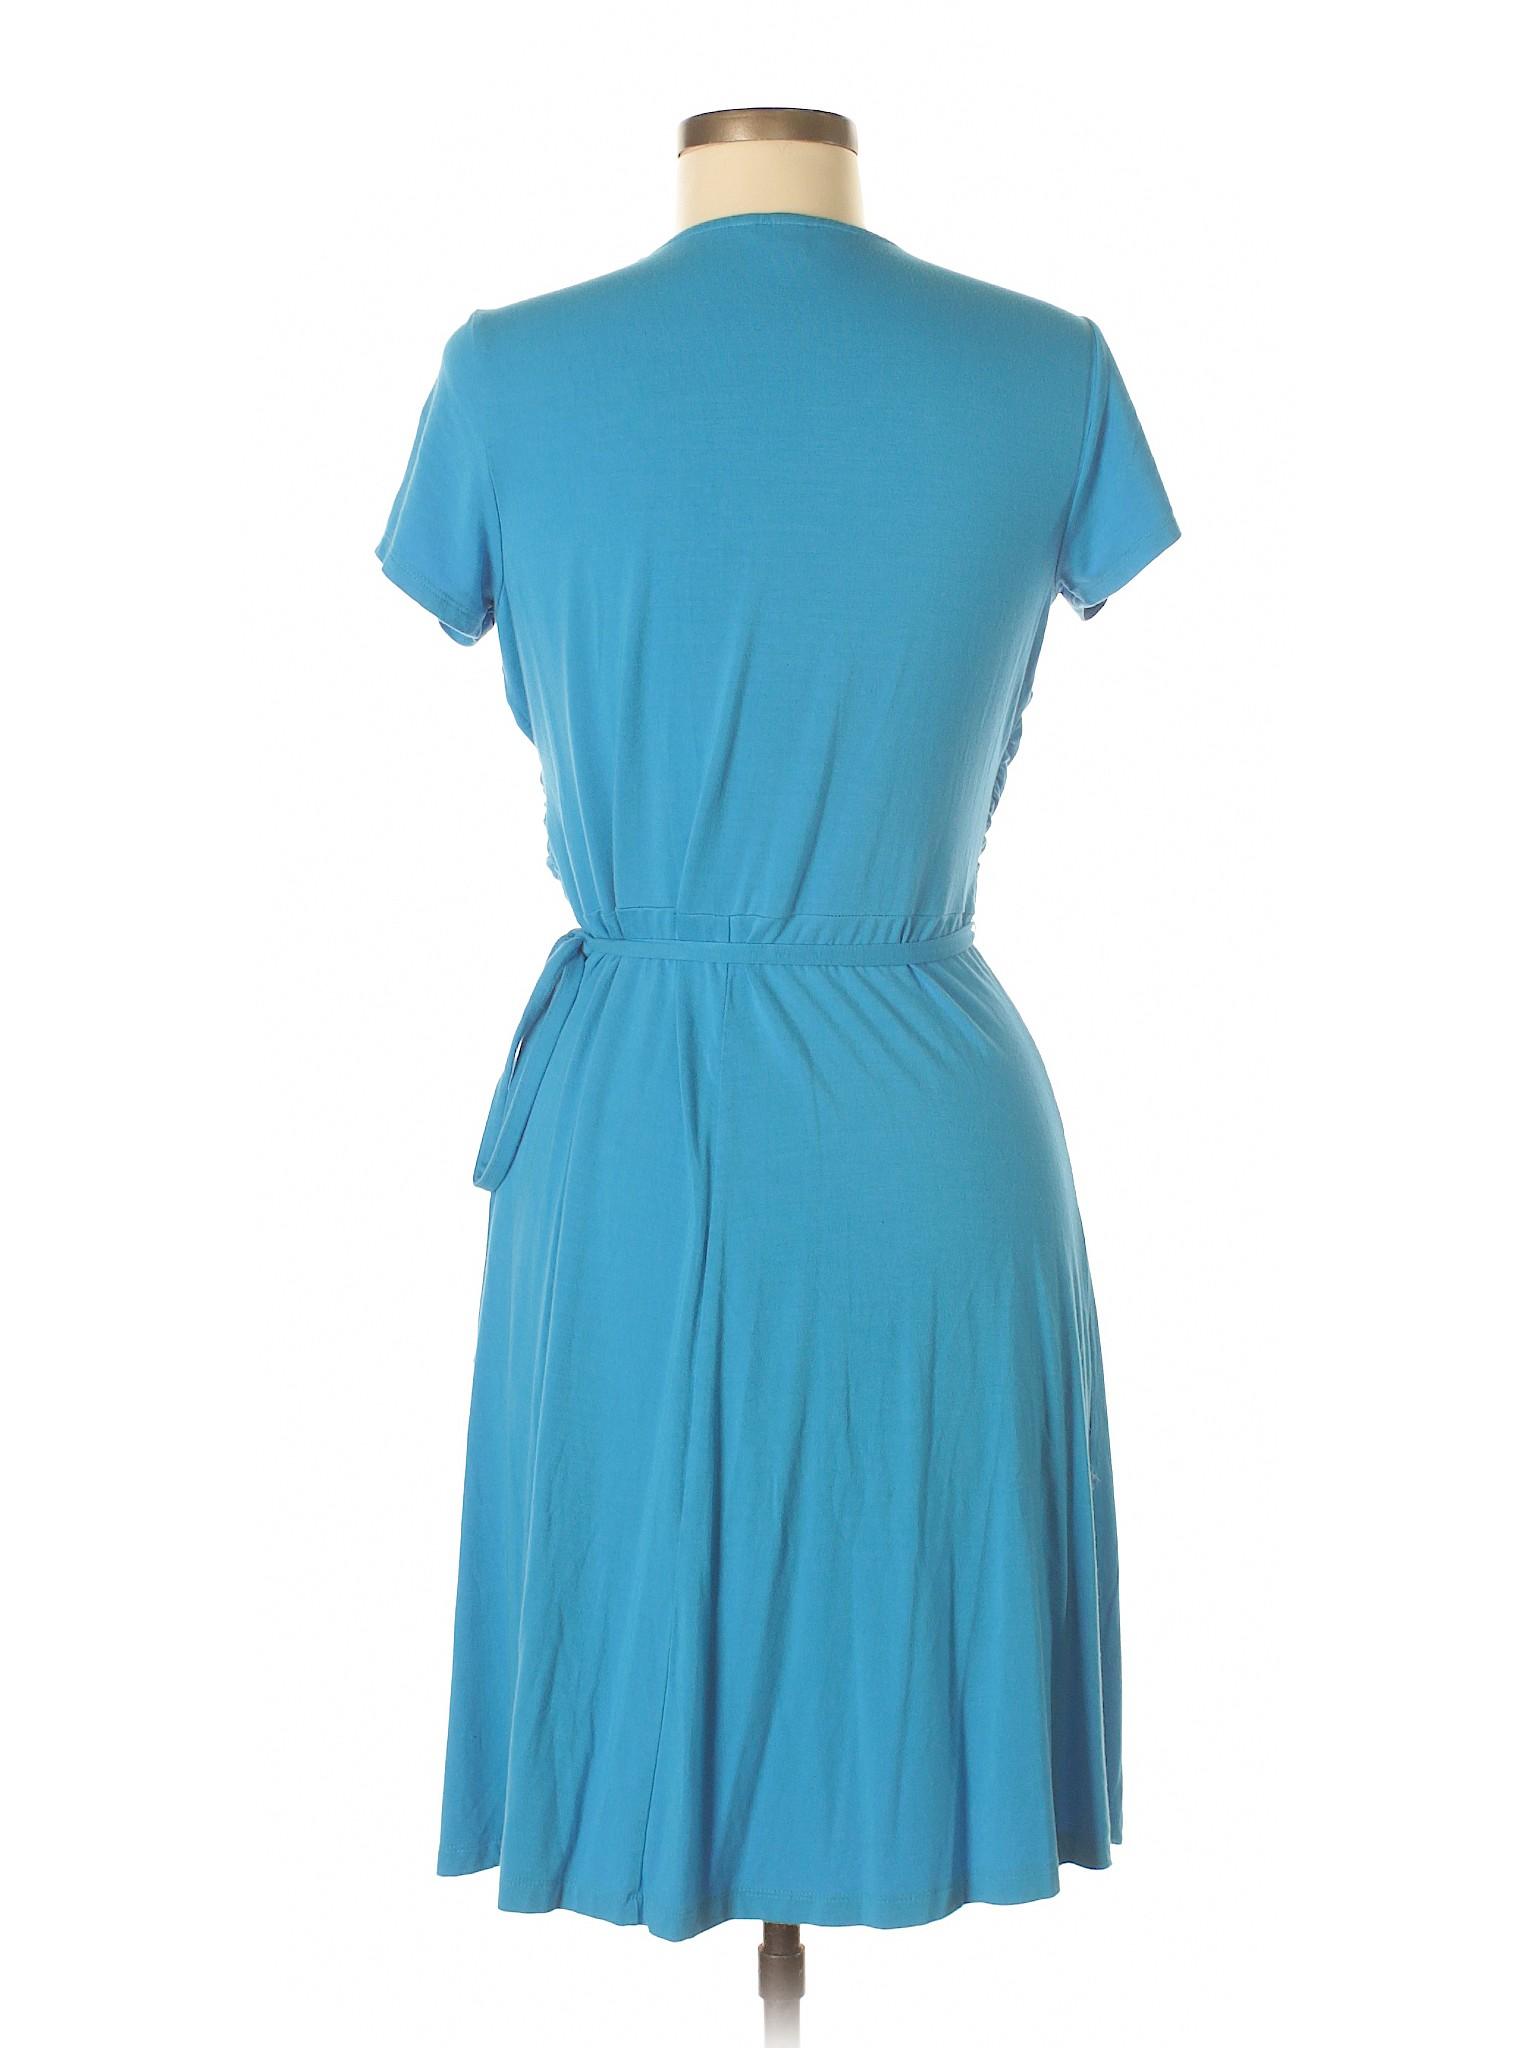 winter Boutique Casual End Dress Lands' w1dq1FU